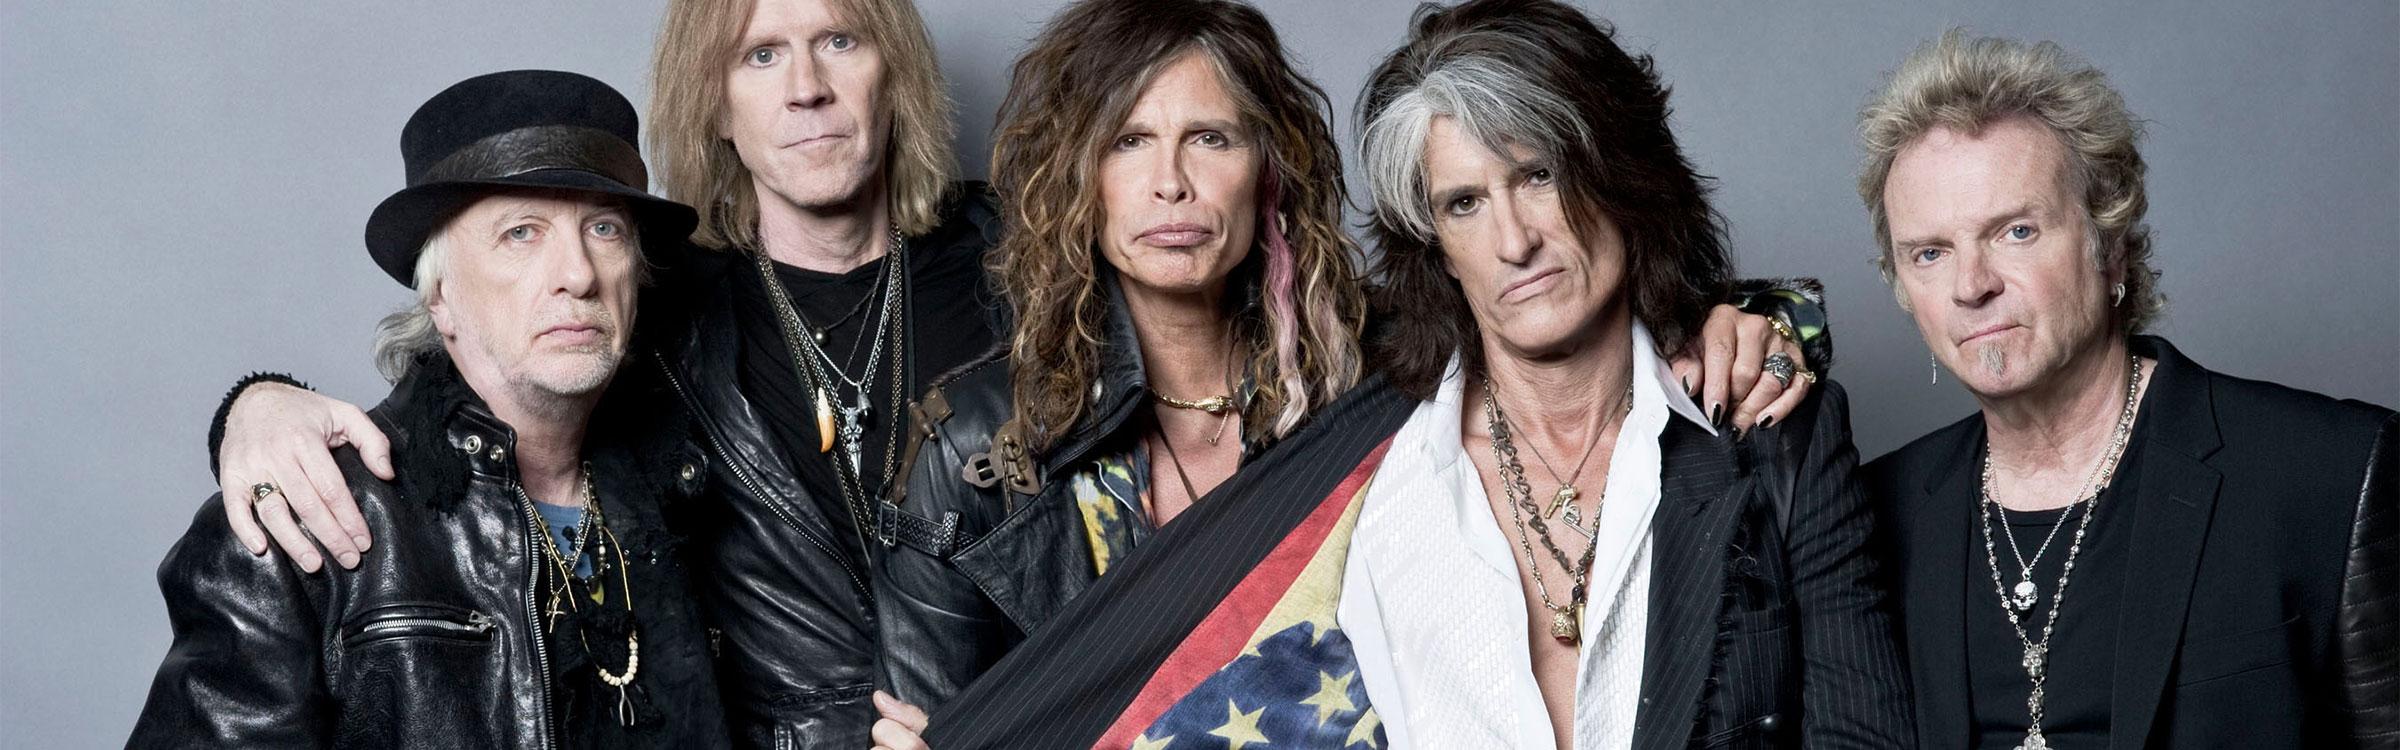 Aerosmith page